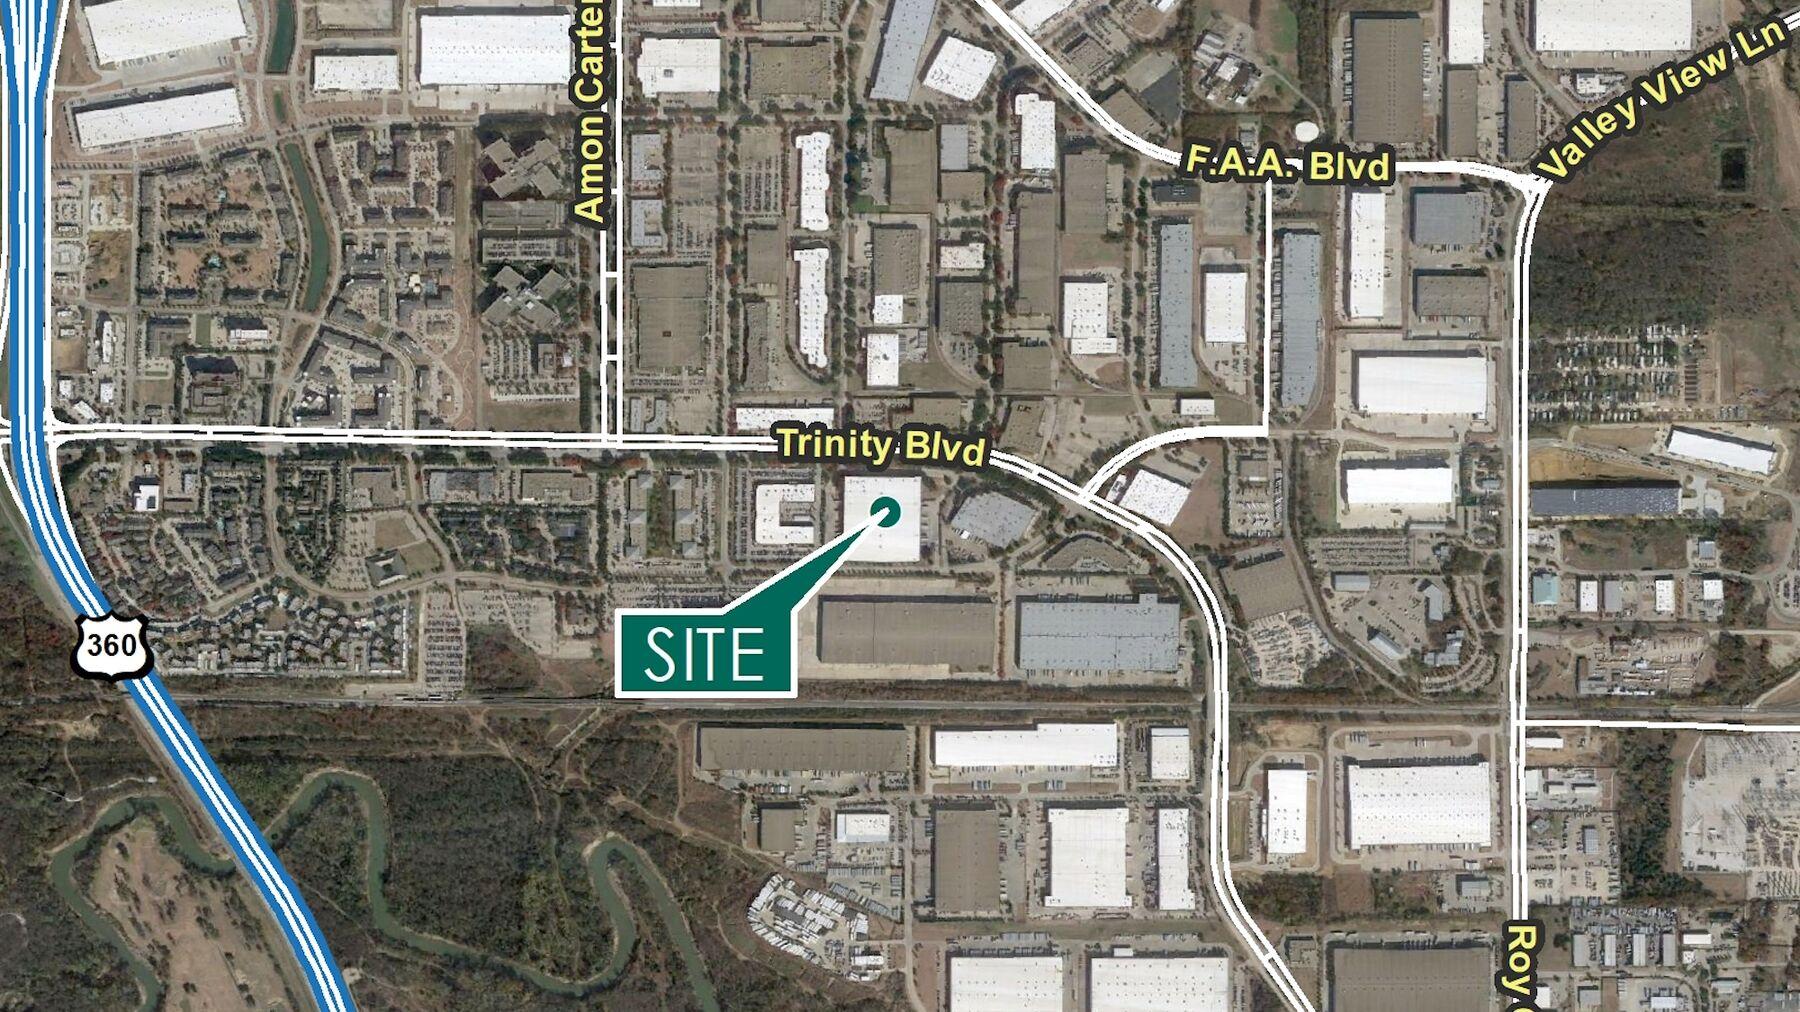 DPM-Prologis-Great-Southwest-83-DAL01783-14900-Trinity-Blvd_AerialMap.jpg